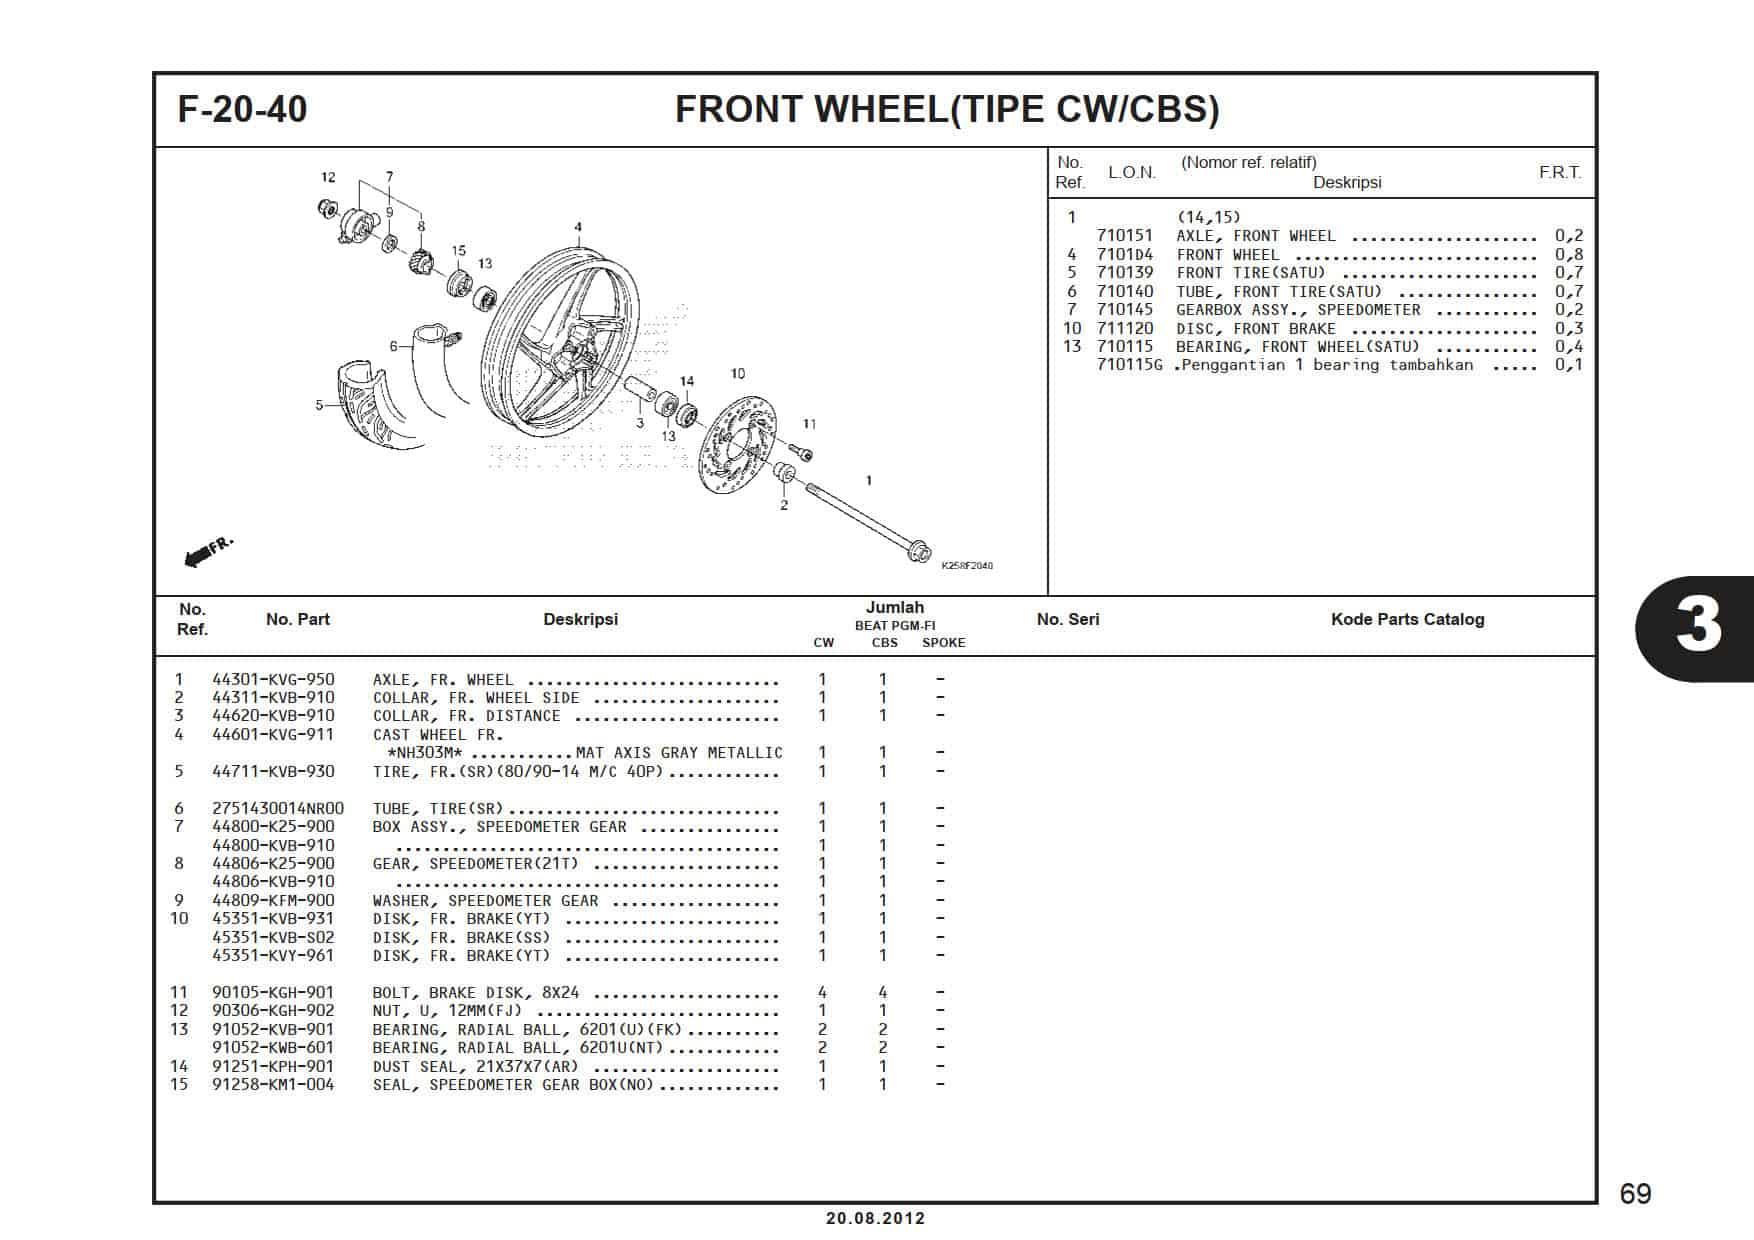 F-20-40 Front Wheel (Tipe CW/CBS)